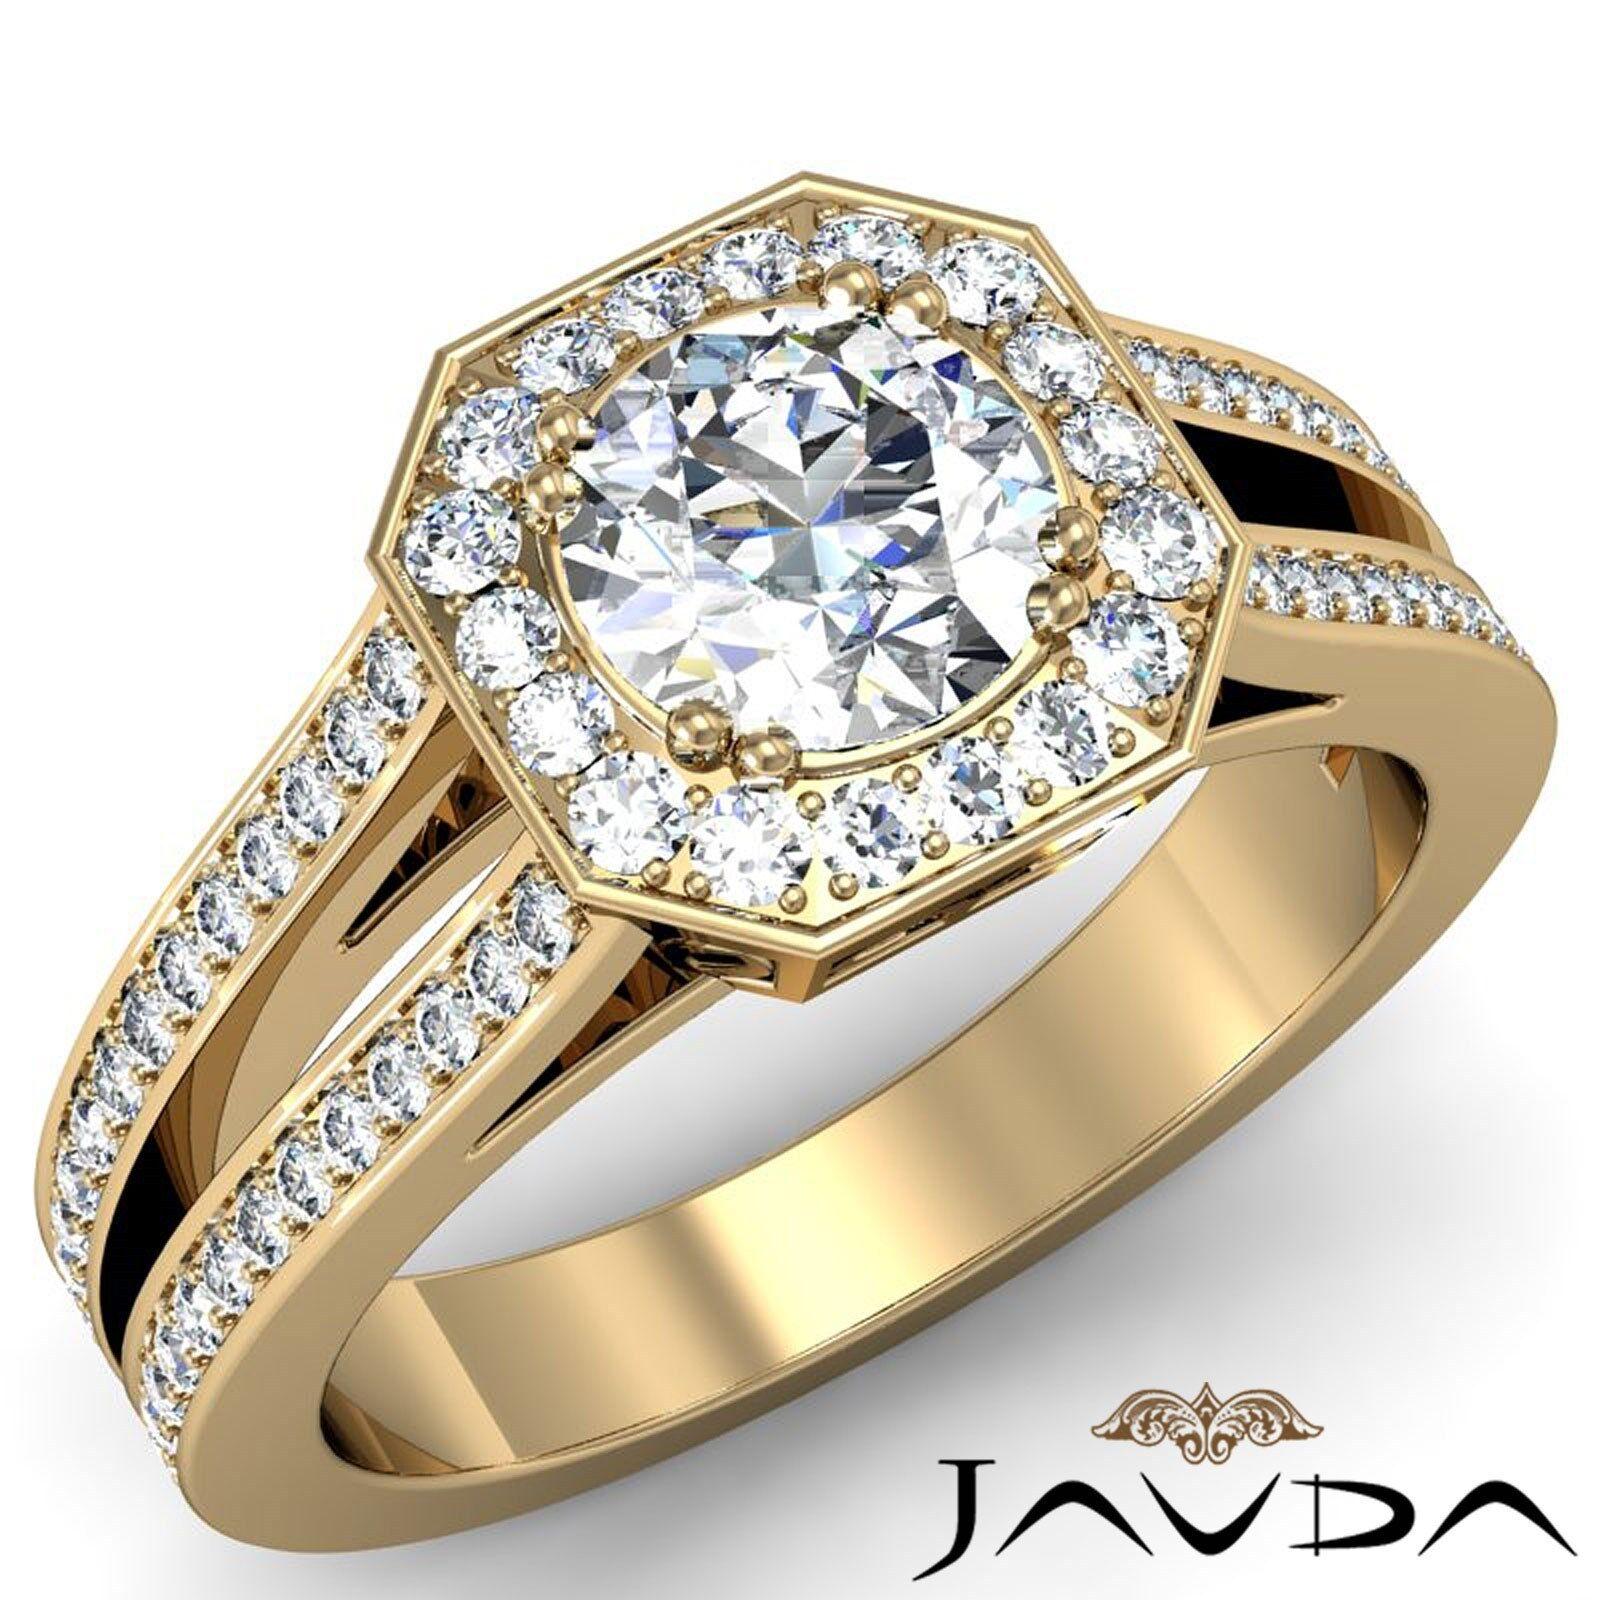 Hexagon Halo Round Diamond Engagement Split Shank Pave Set Ring GIA F VS1 2.46Ct